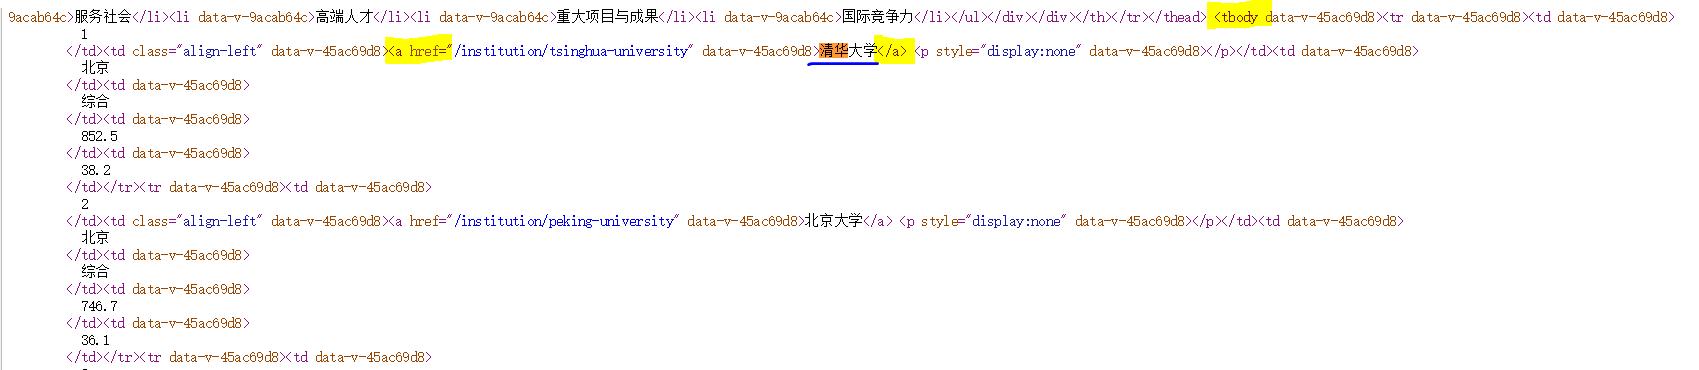 Python爬虫入门实例三之爬取软科中国大学排名